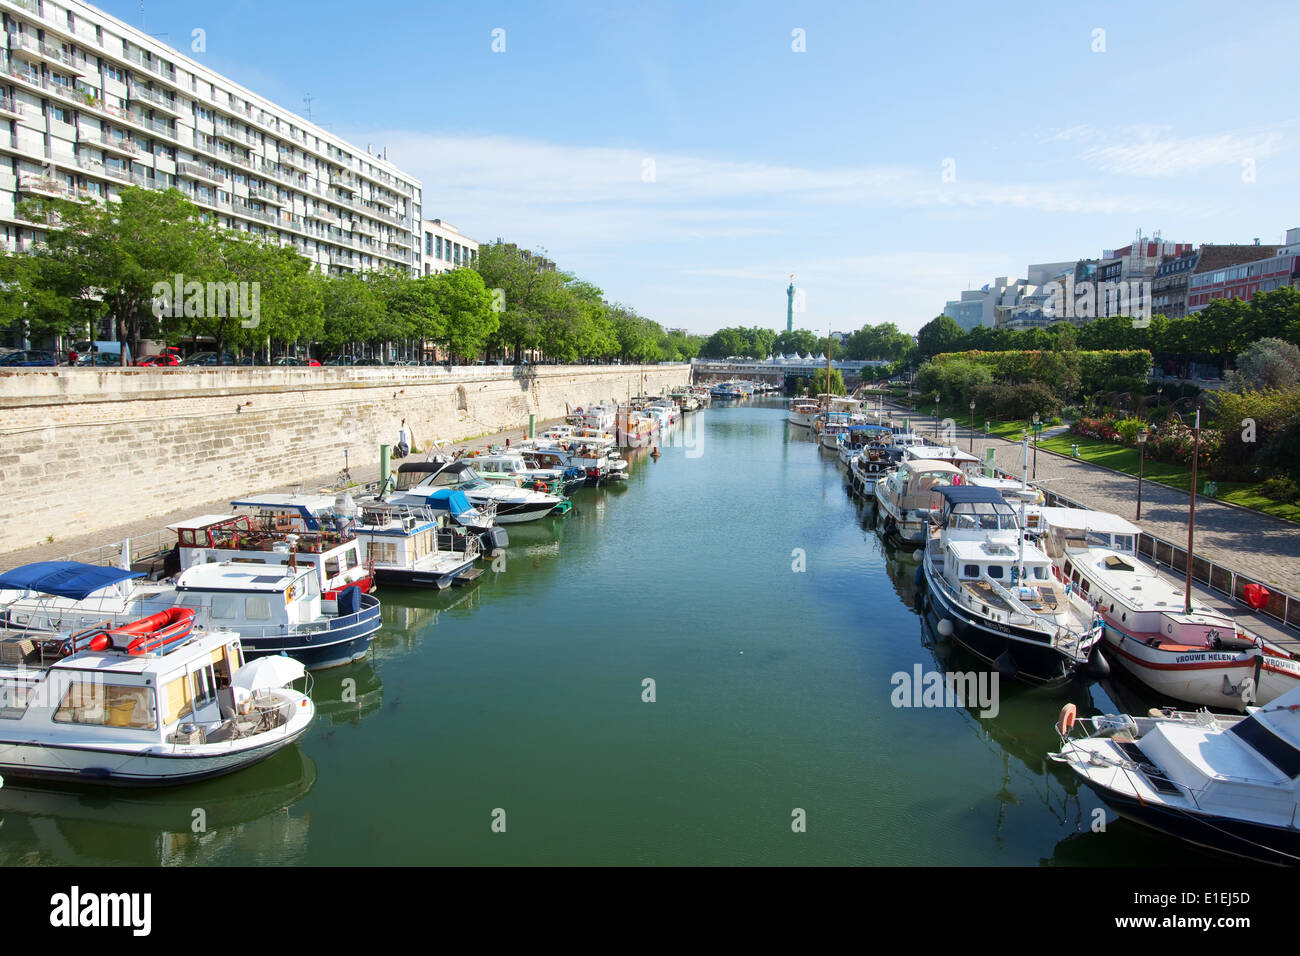 Bassin de l'Arsenal, Canal Saint-Martin, Paris - Stock Image